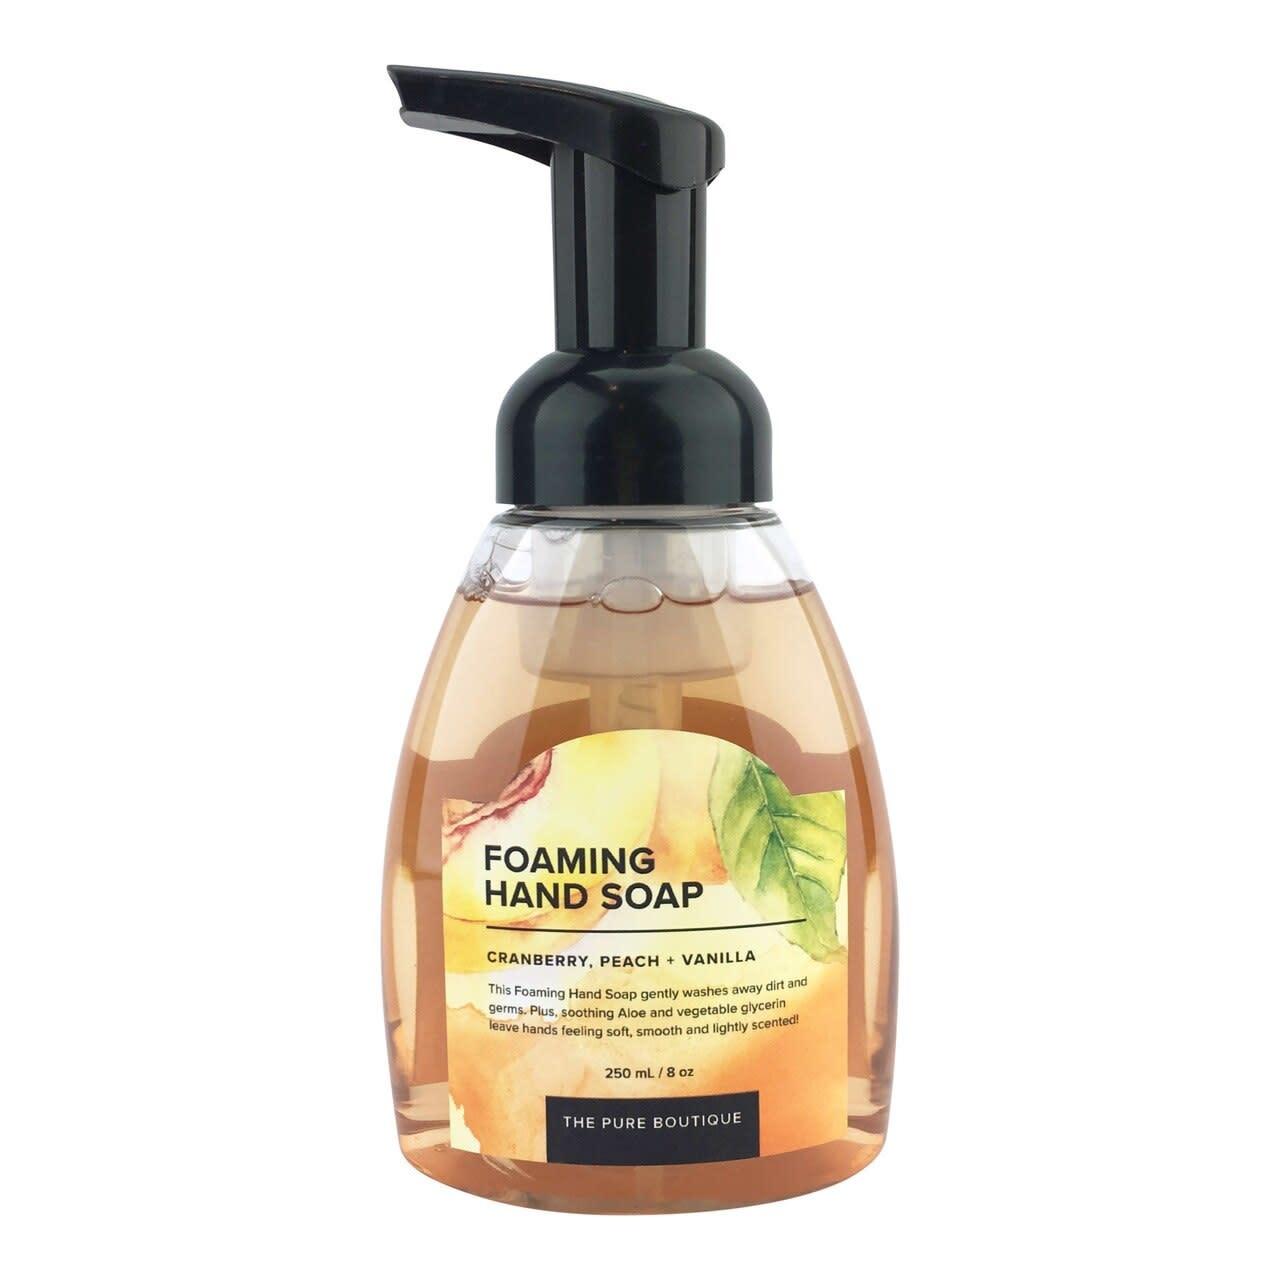 Foaming Hand Soap - Cranberry, Peach, and Vanilla-1